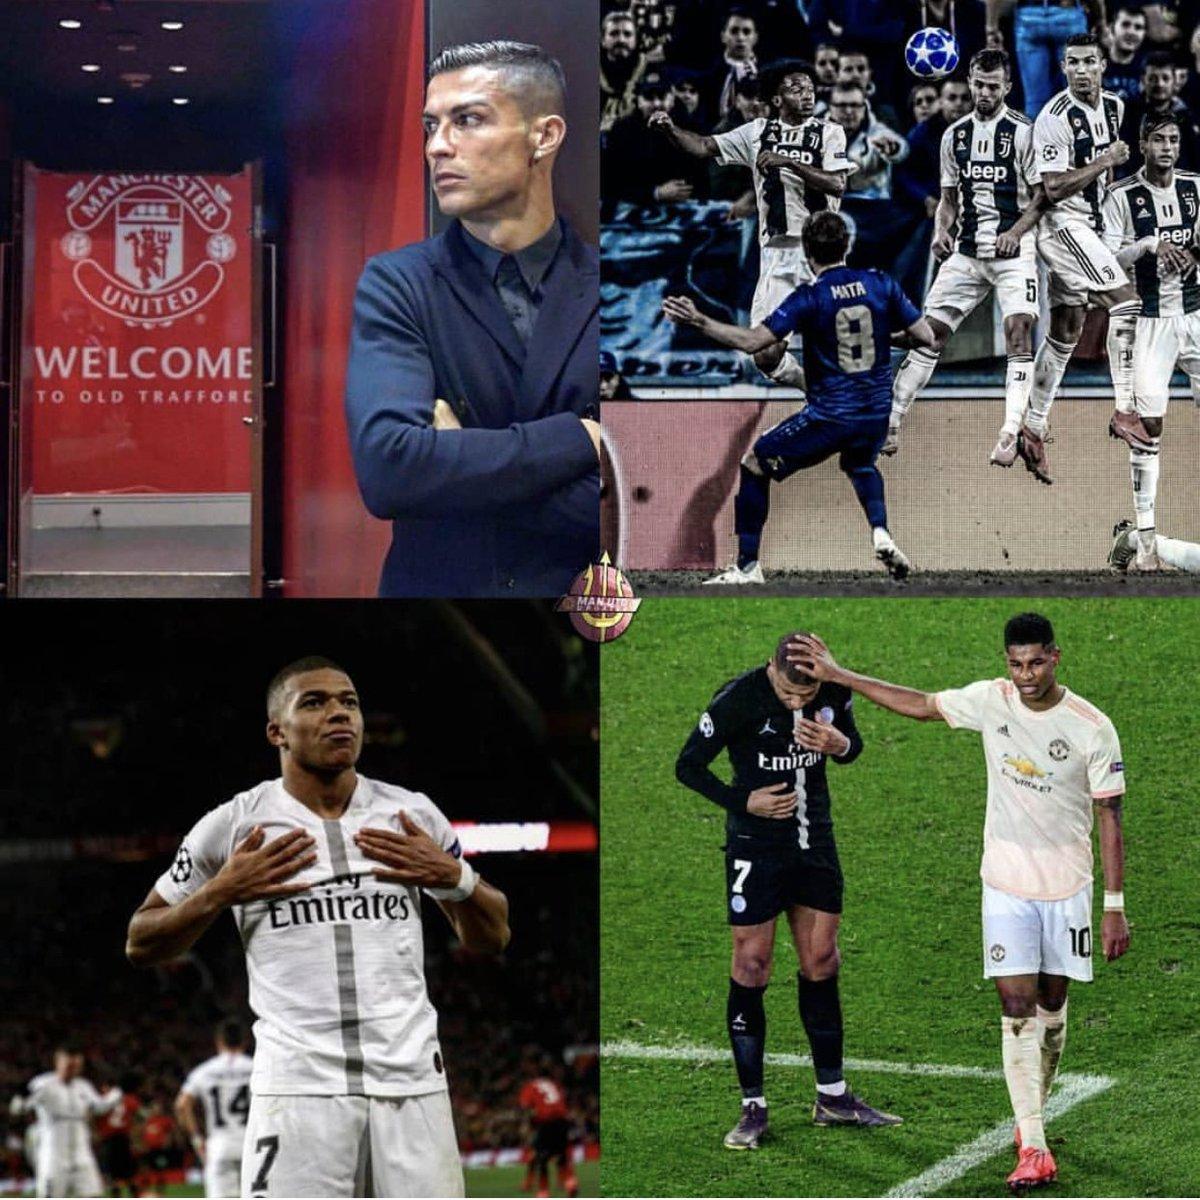 Man United in Pidgin's photo on Ronaldo